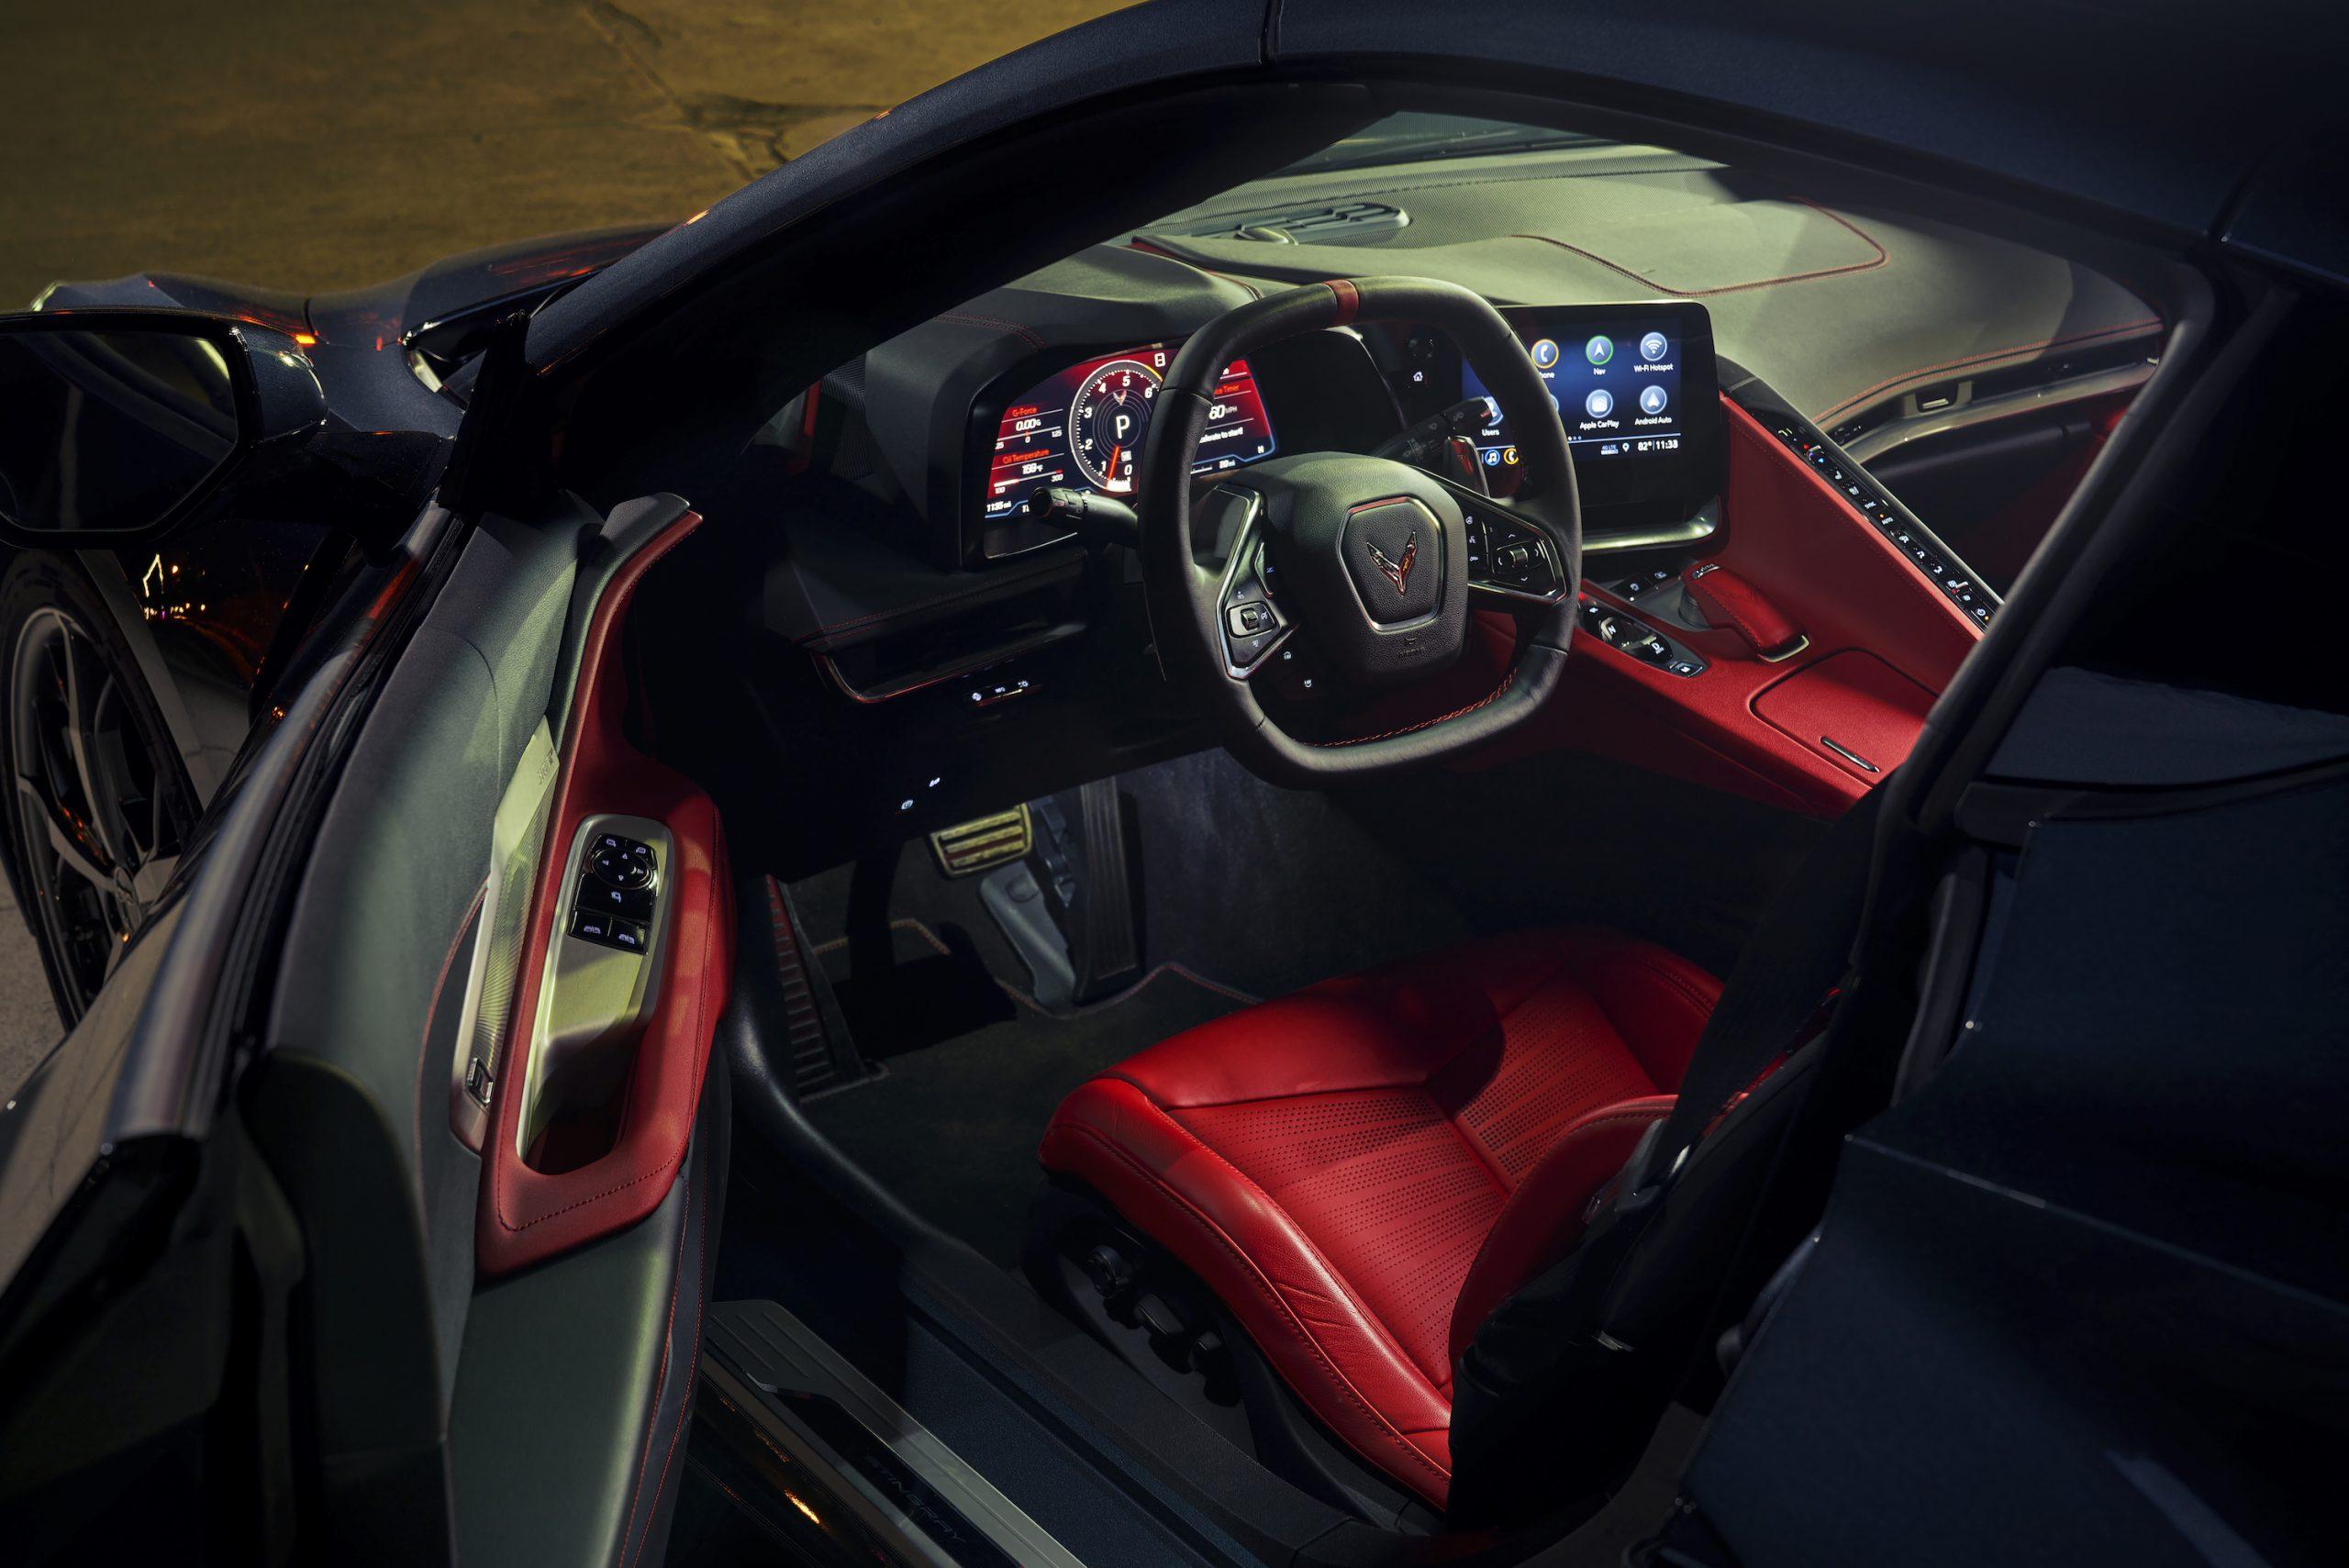 2020 Chevrolet Corvette Stingray 2LT C8 Interior Angle Cockpit